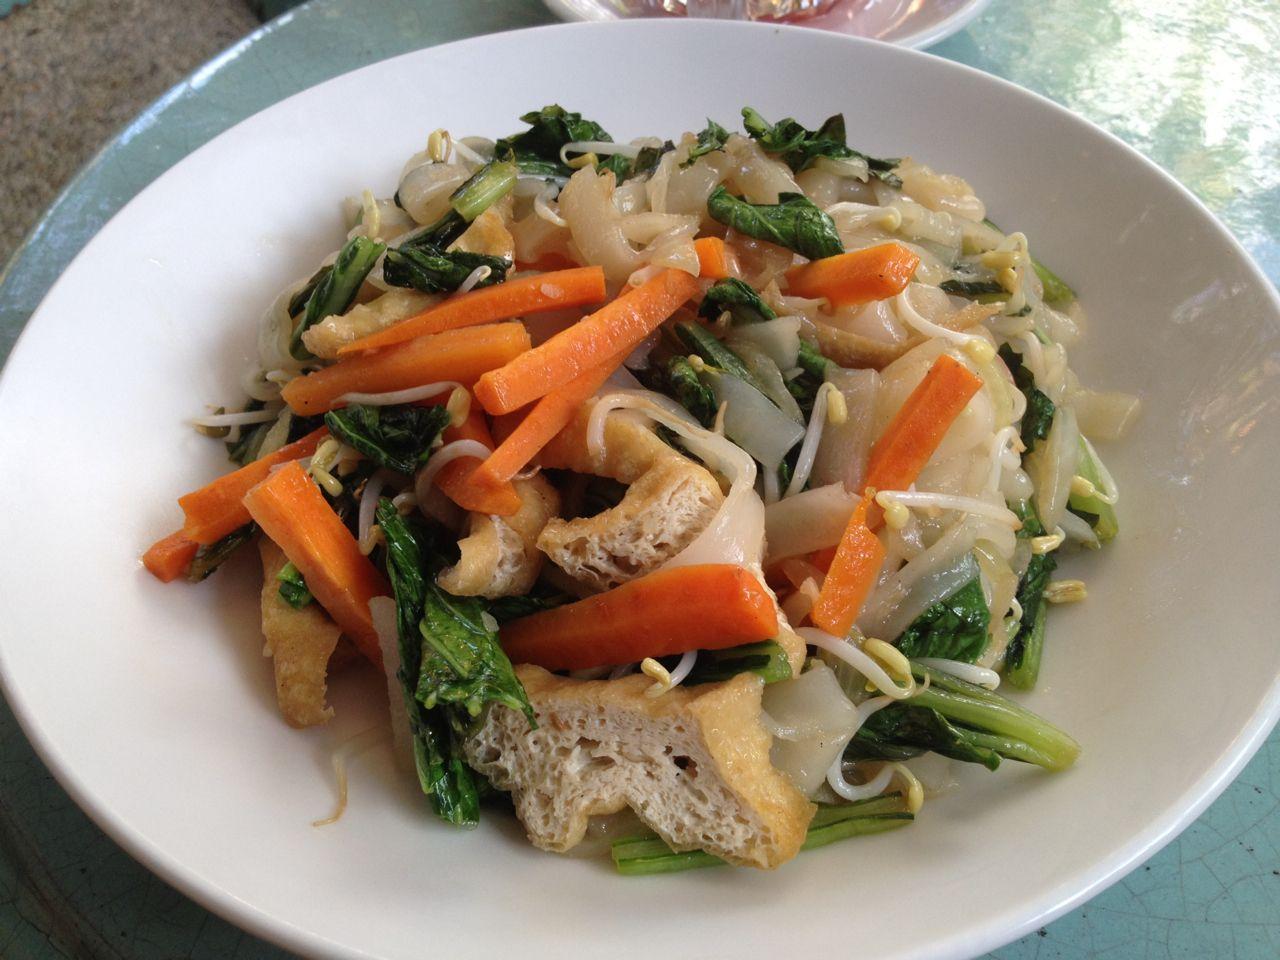 Wok Wok Wok Mmm, foods taste so good stir fried in a wok